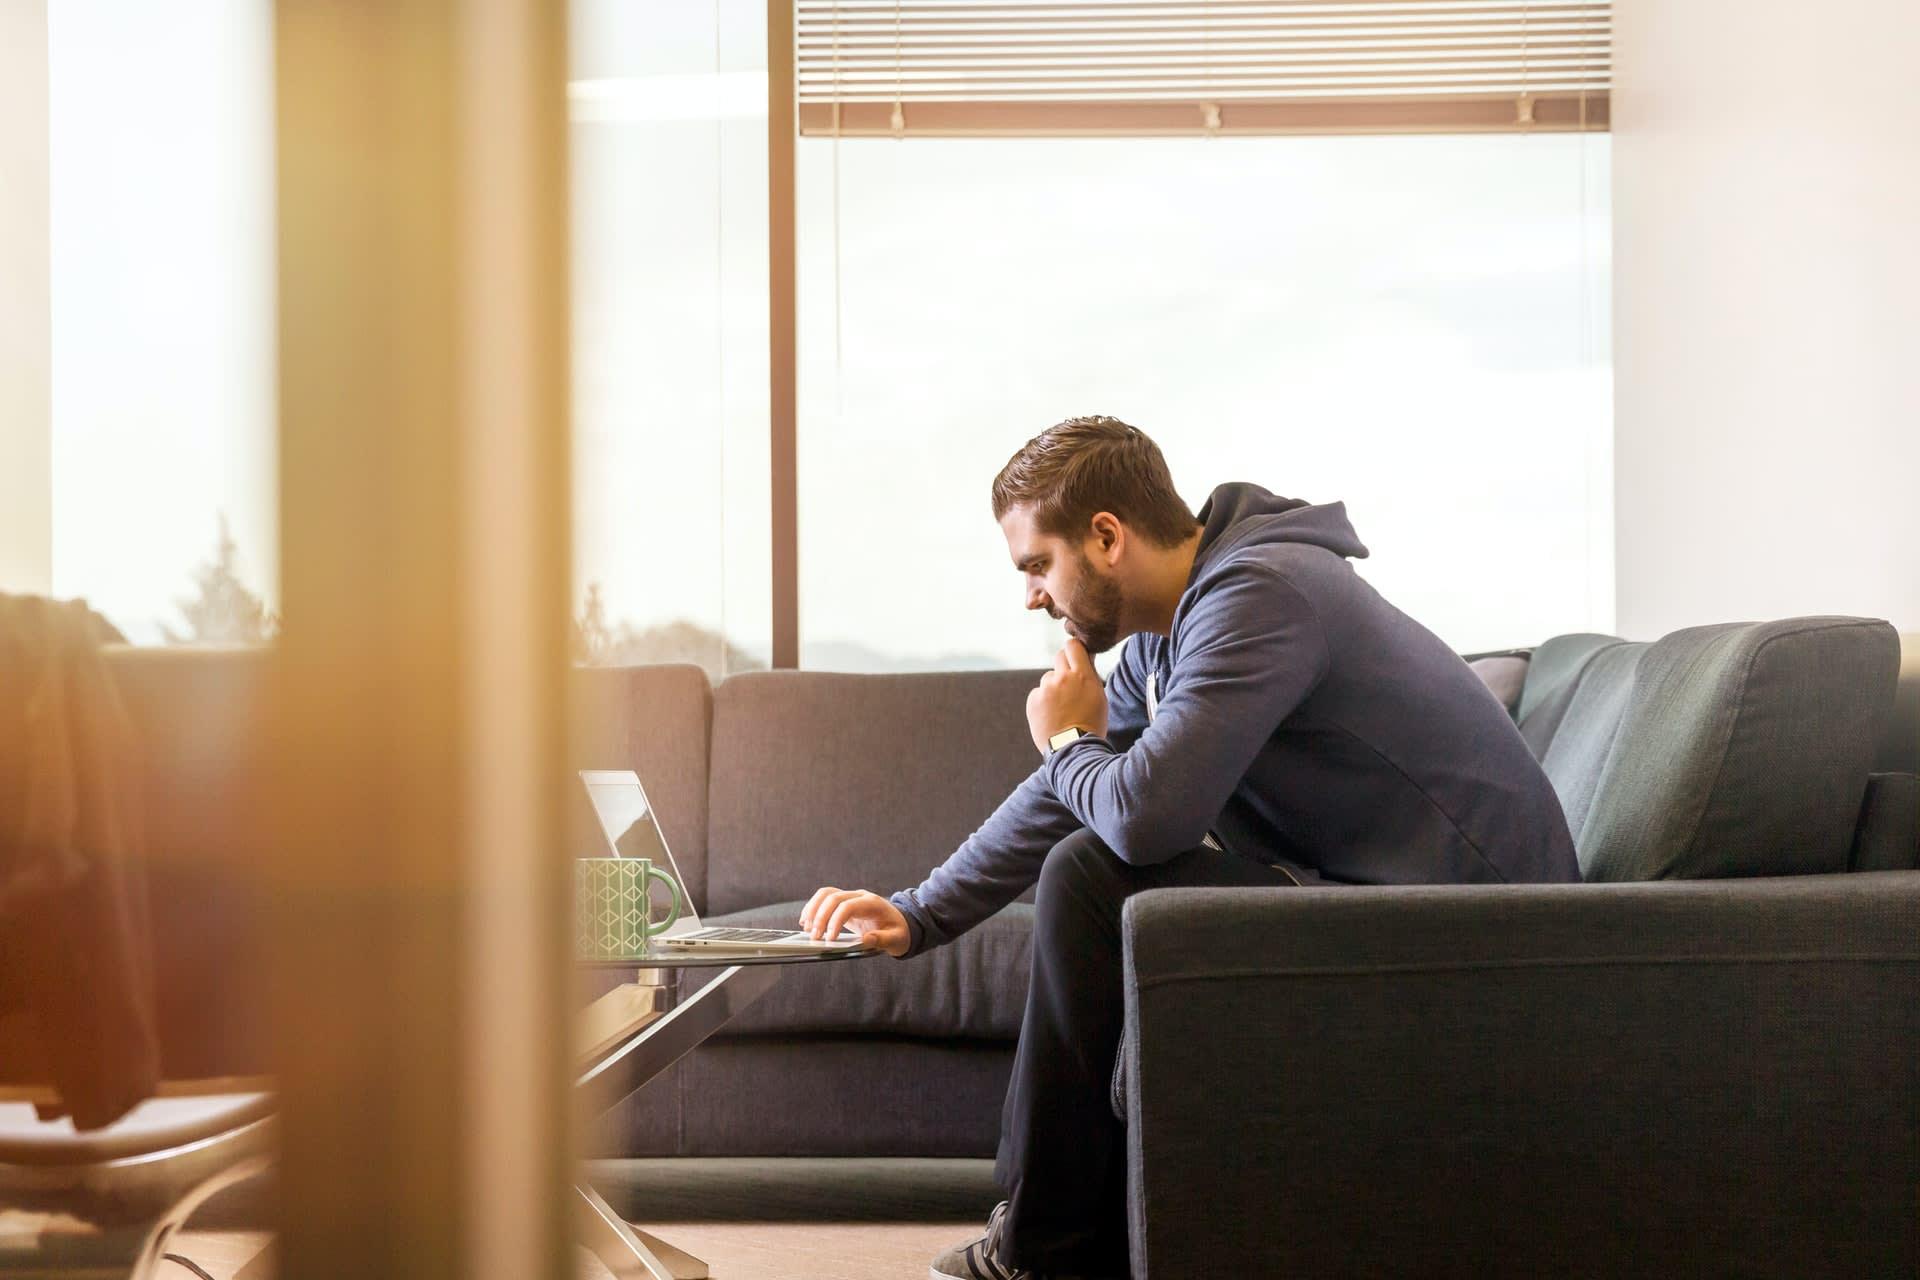 Man on laptop sitting on sofa